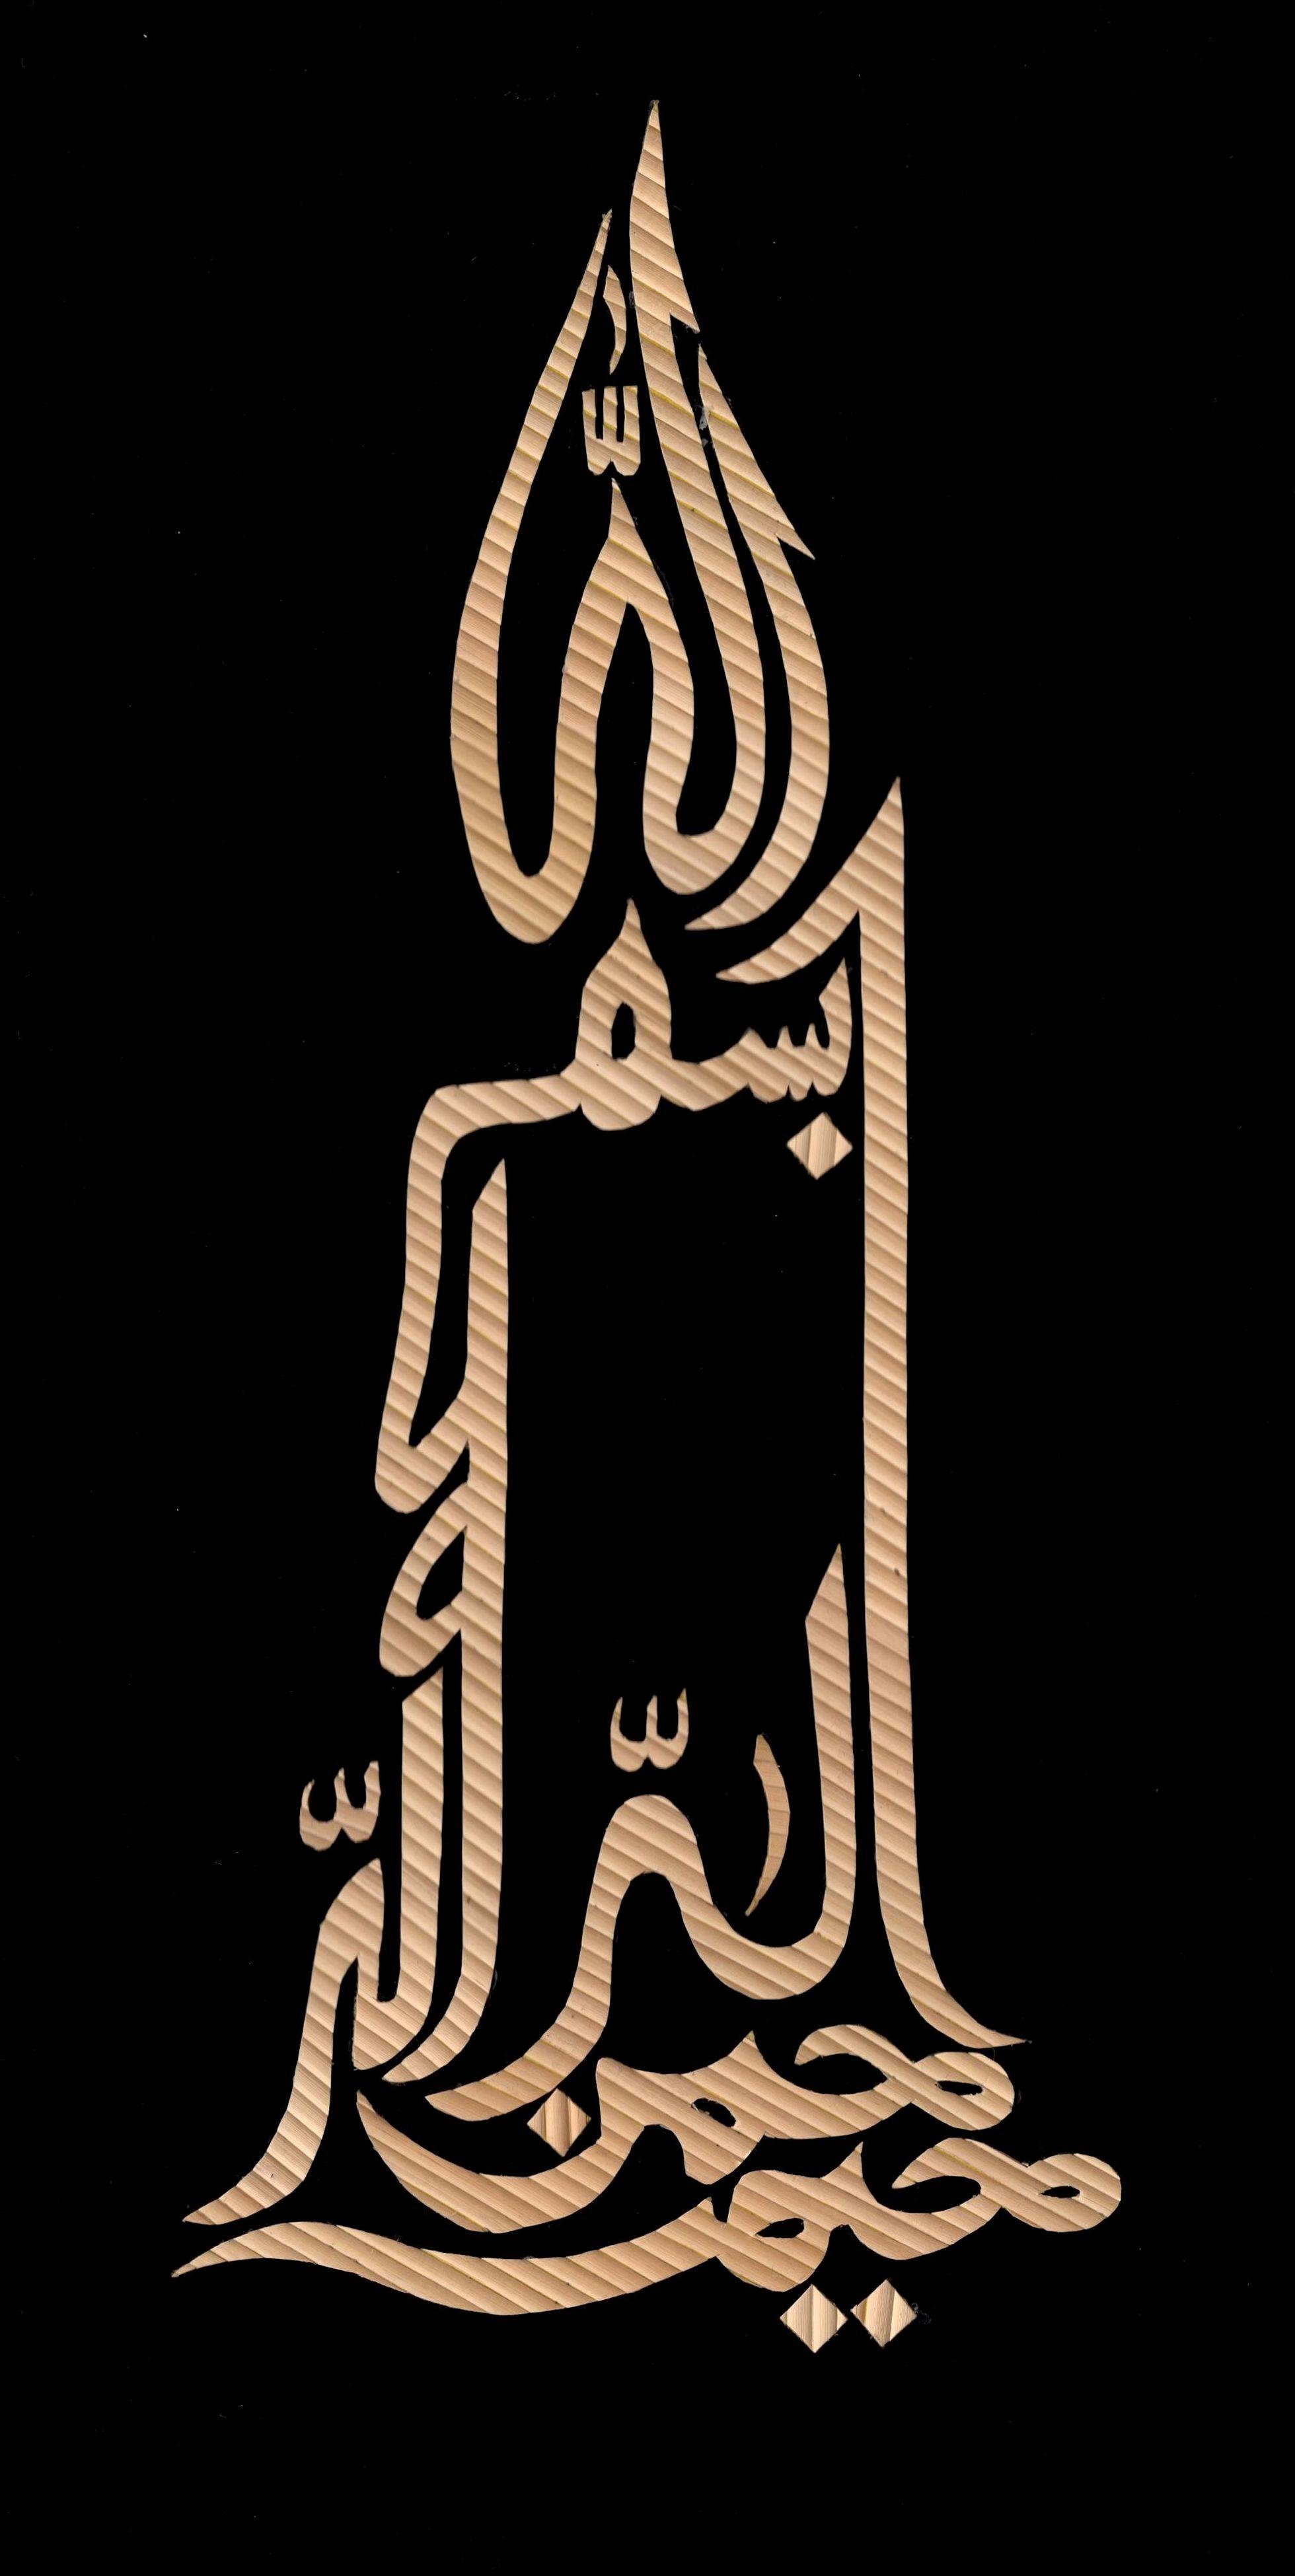 Muslim Wall Decor Art Handmade Islamic Calligraphy Wood Velvet